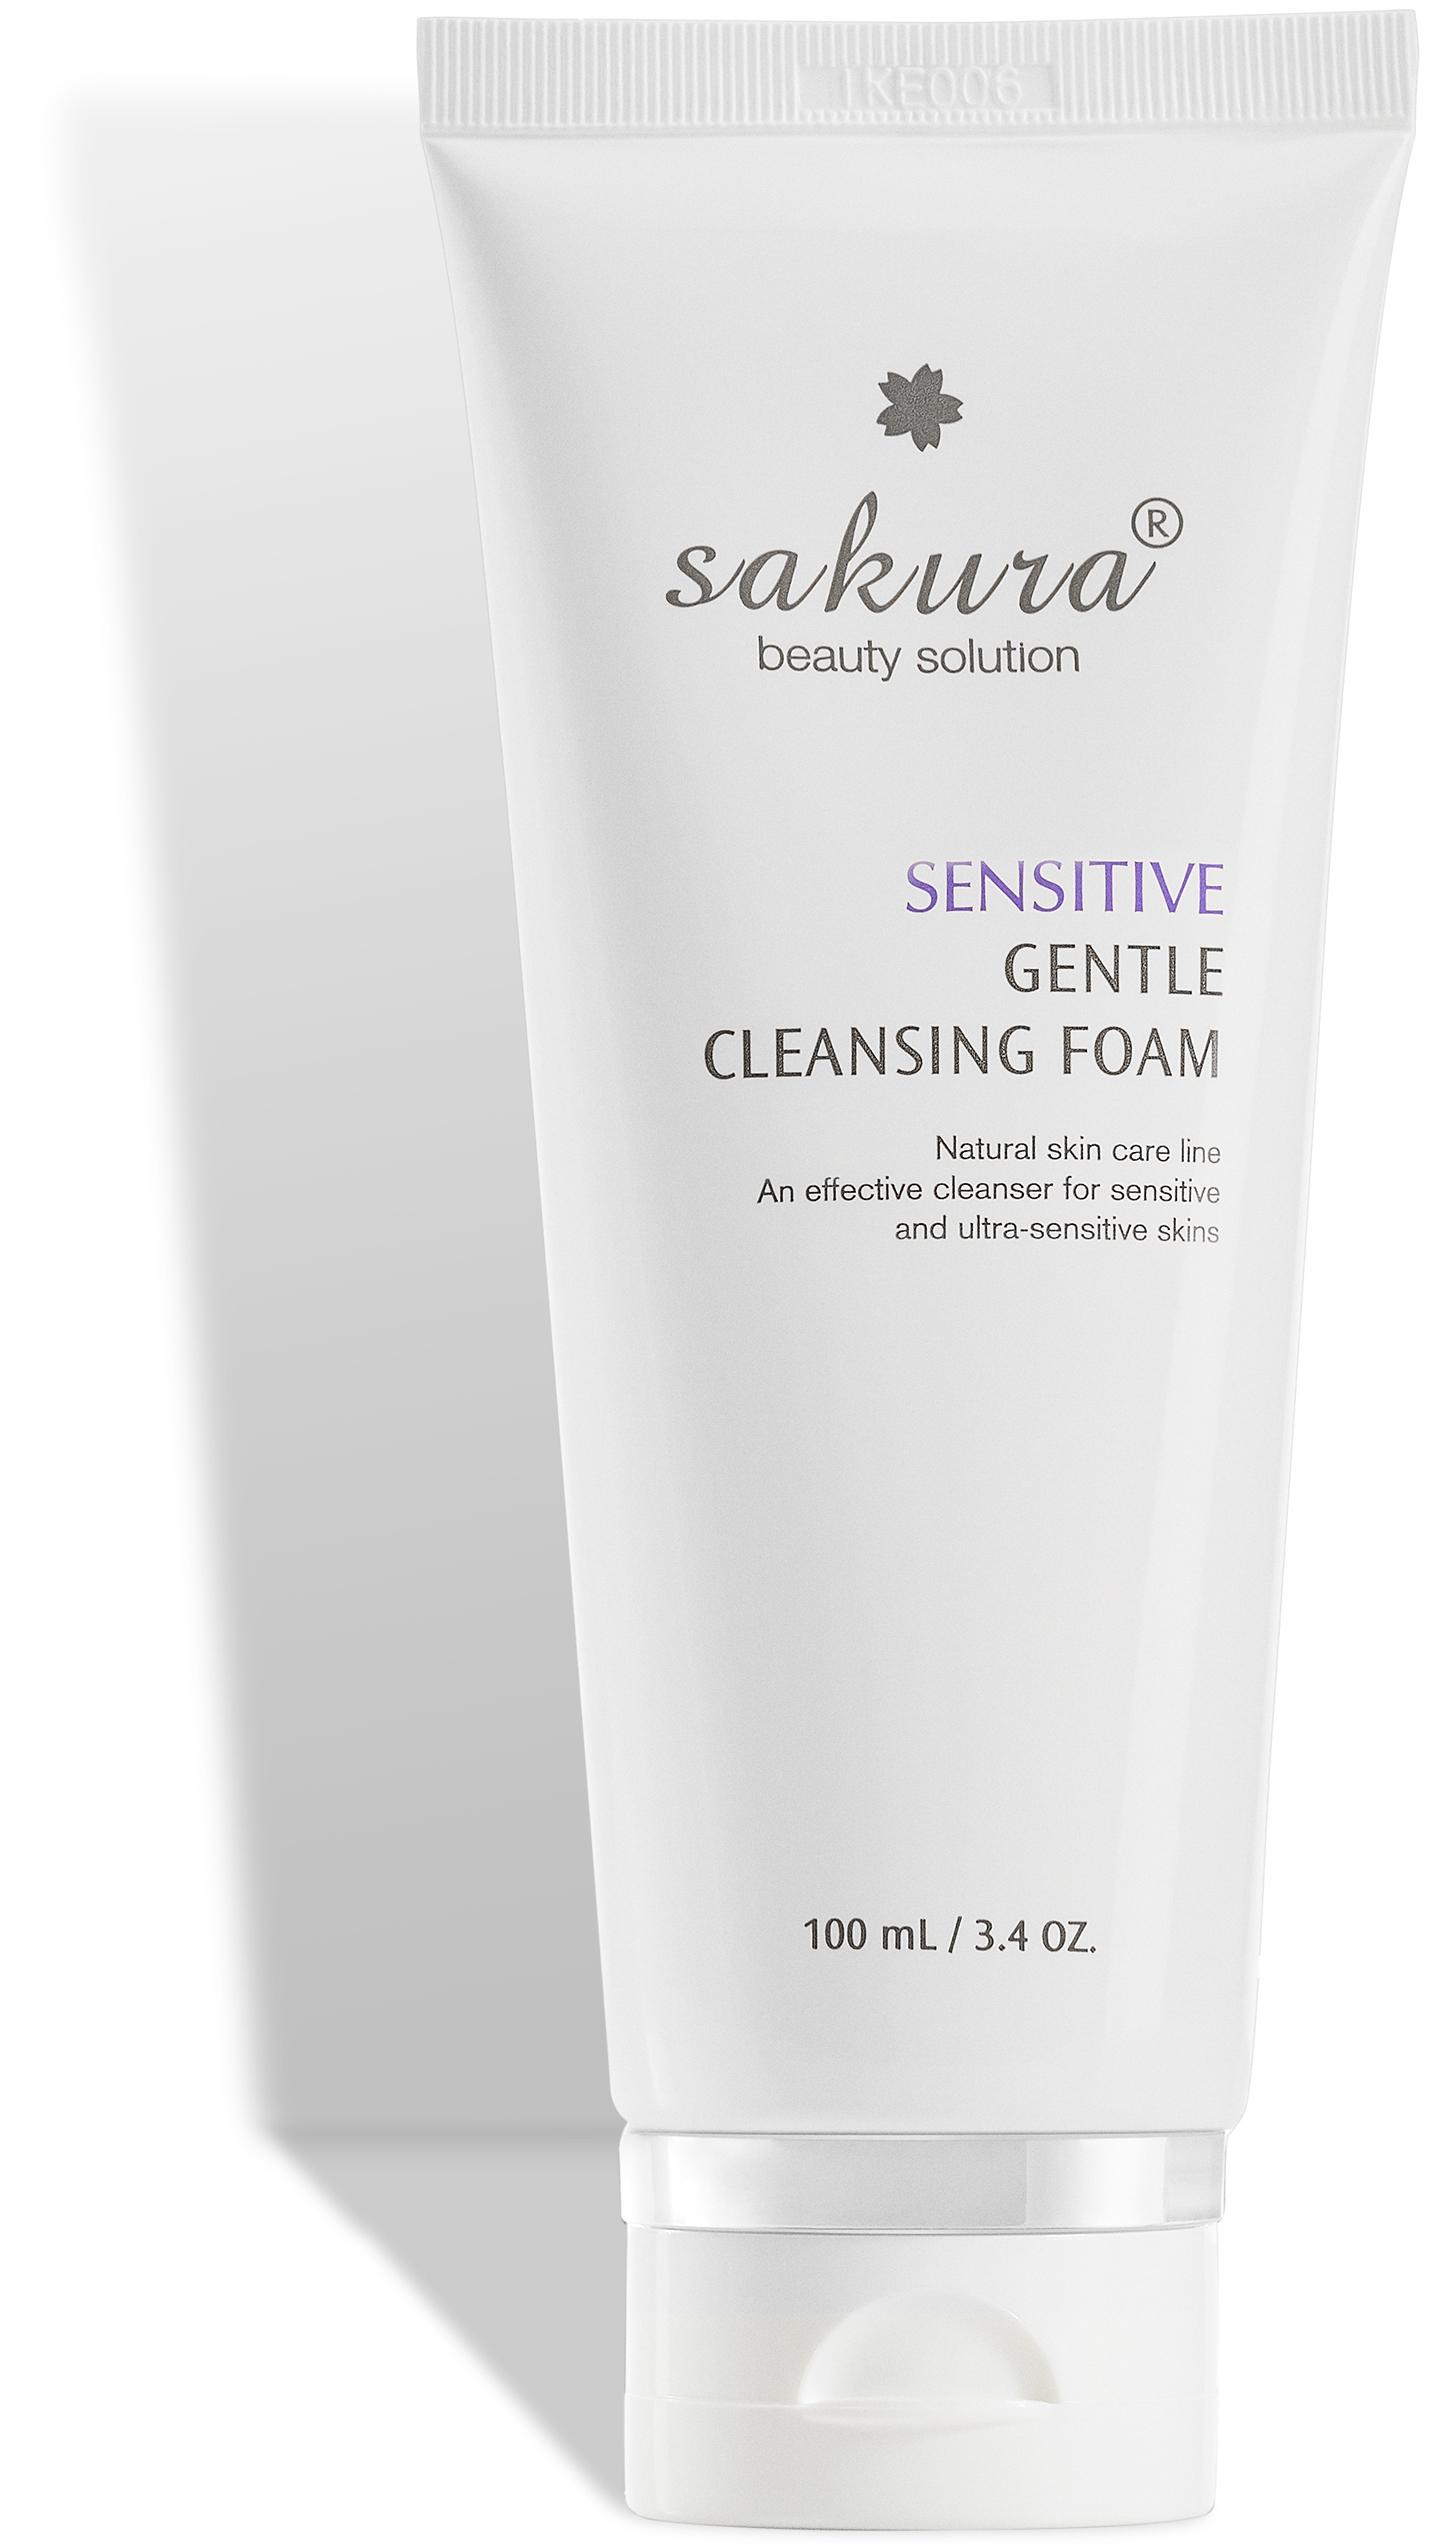 Sakura sensitive gentle cleansing foam